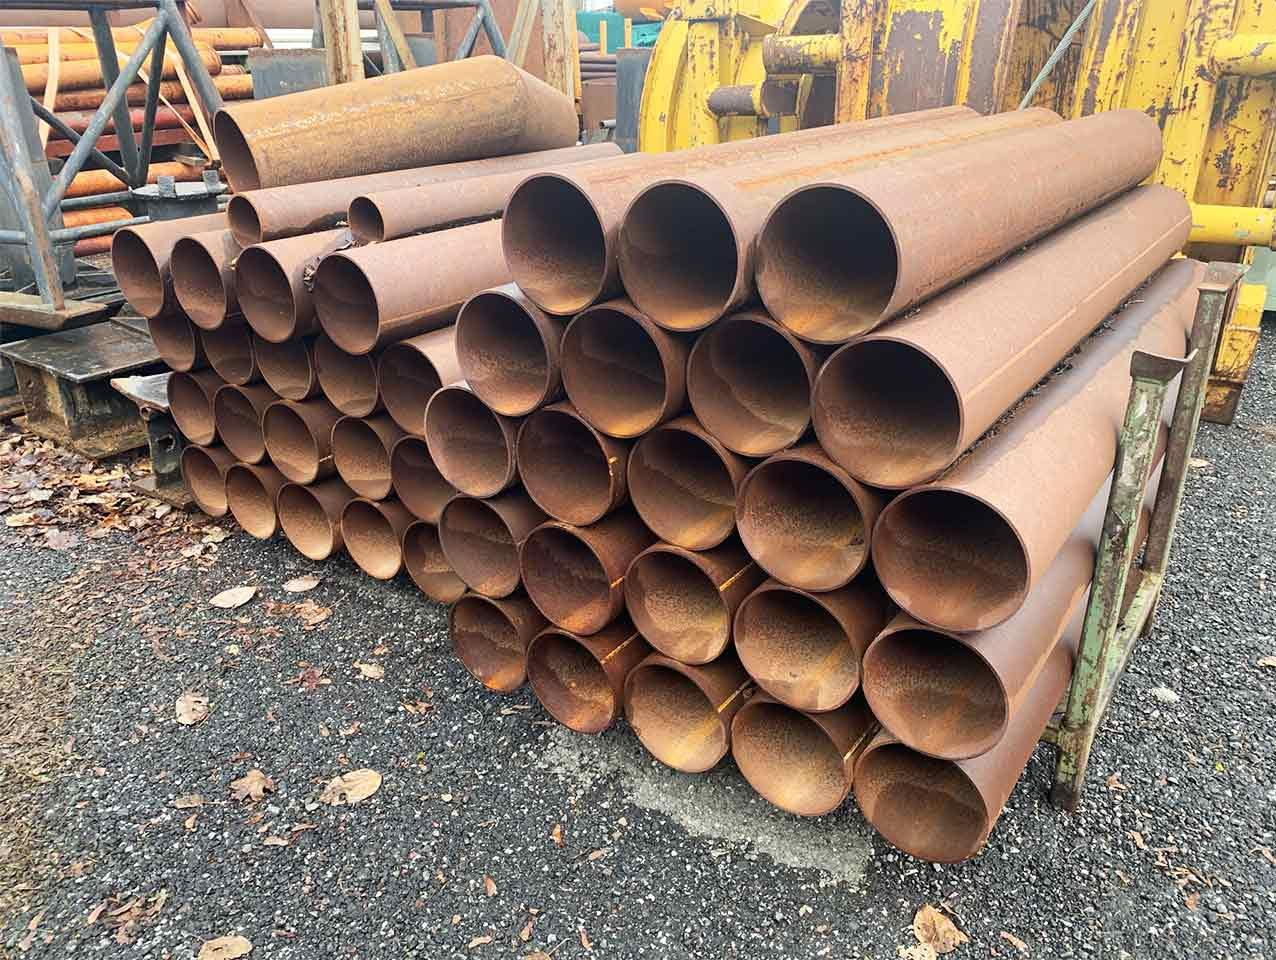 Drill pipes € 820 per tonne